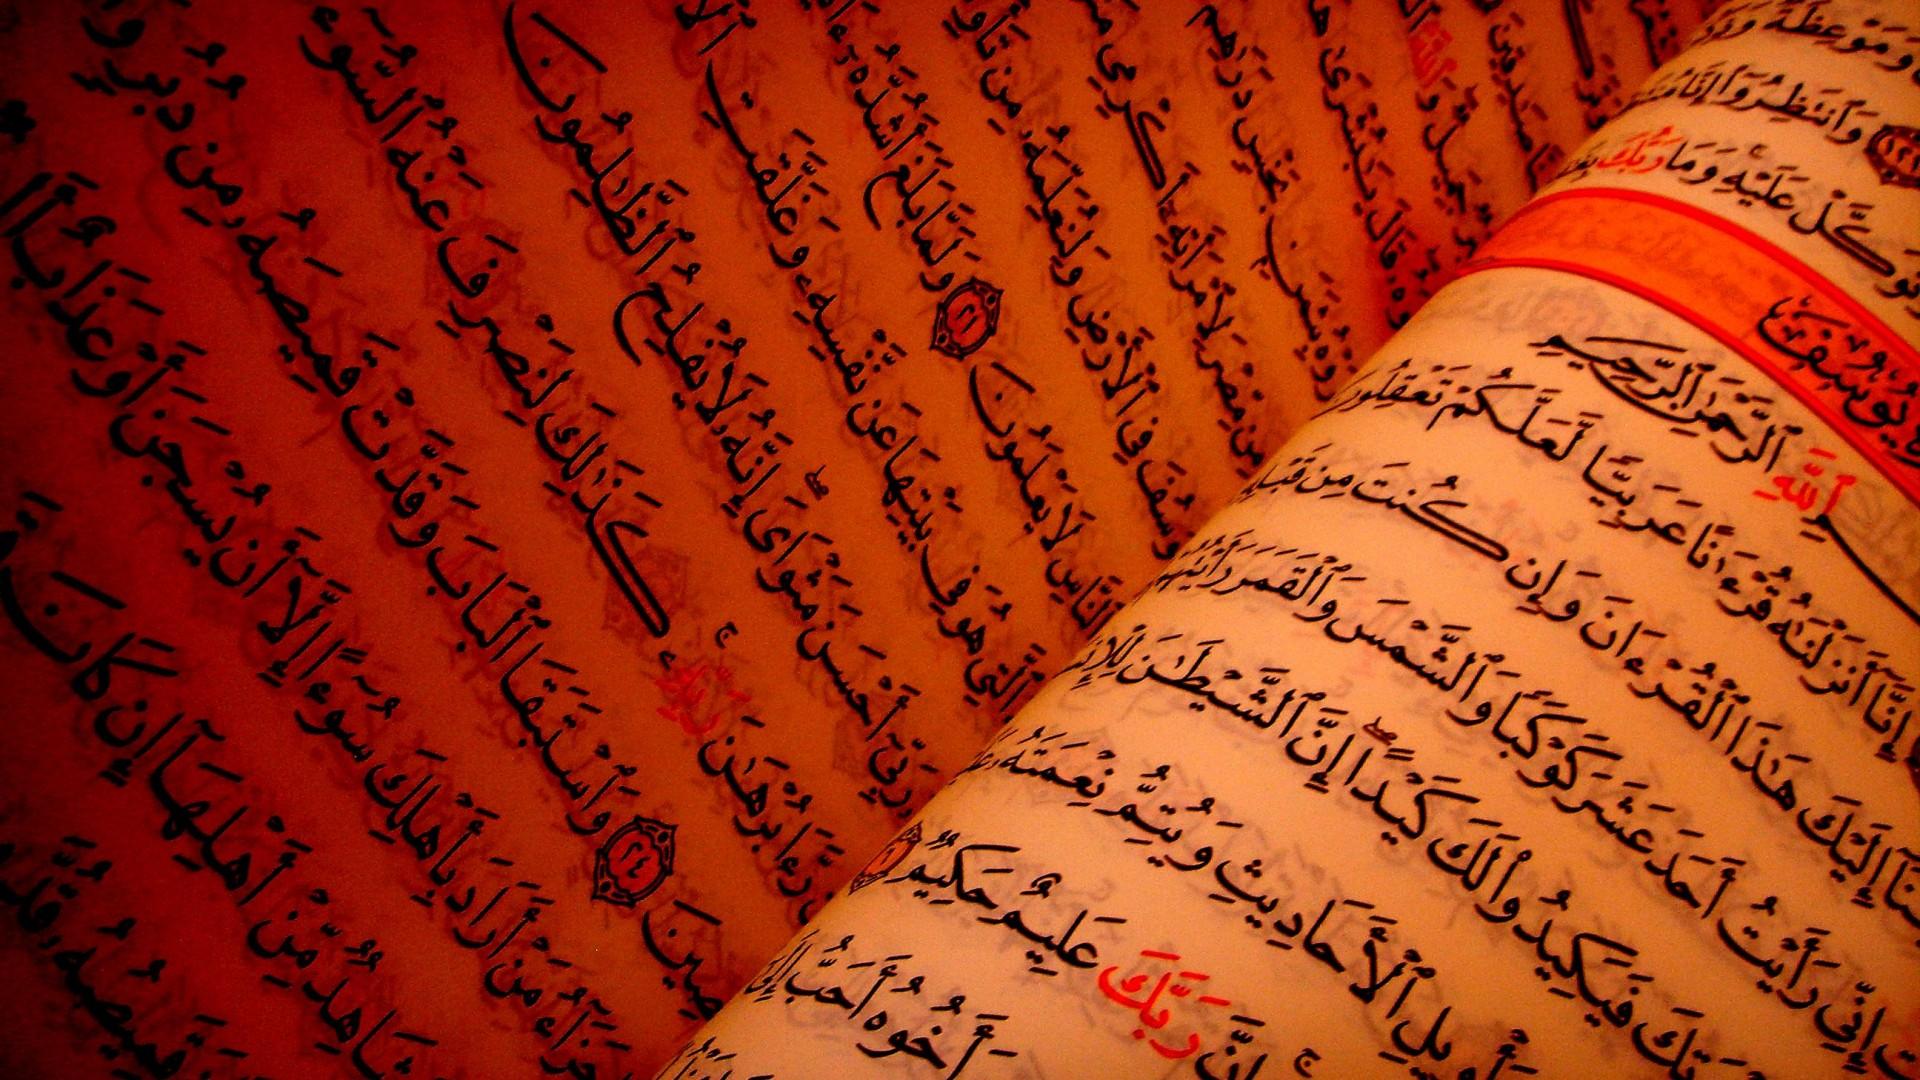 Quran Text HD Desktop Wallpaper High Quality WallpapersWallpaper 1920x1080